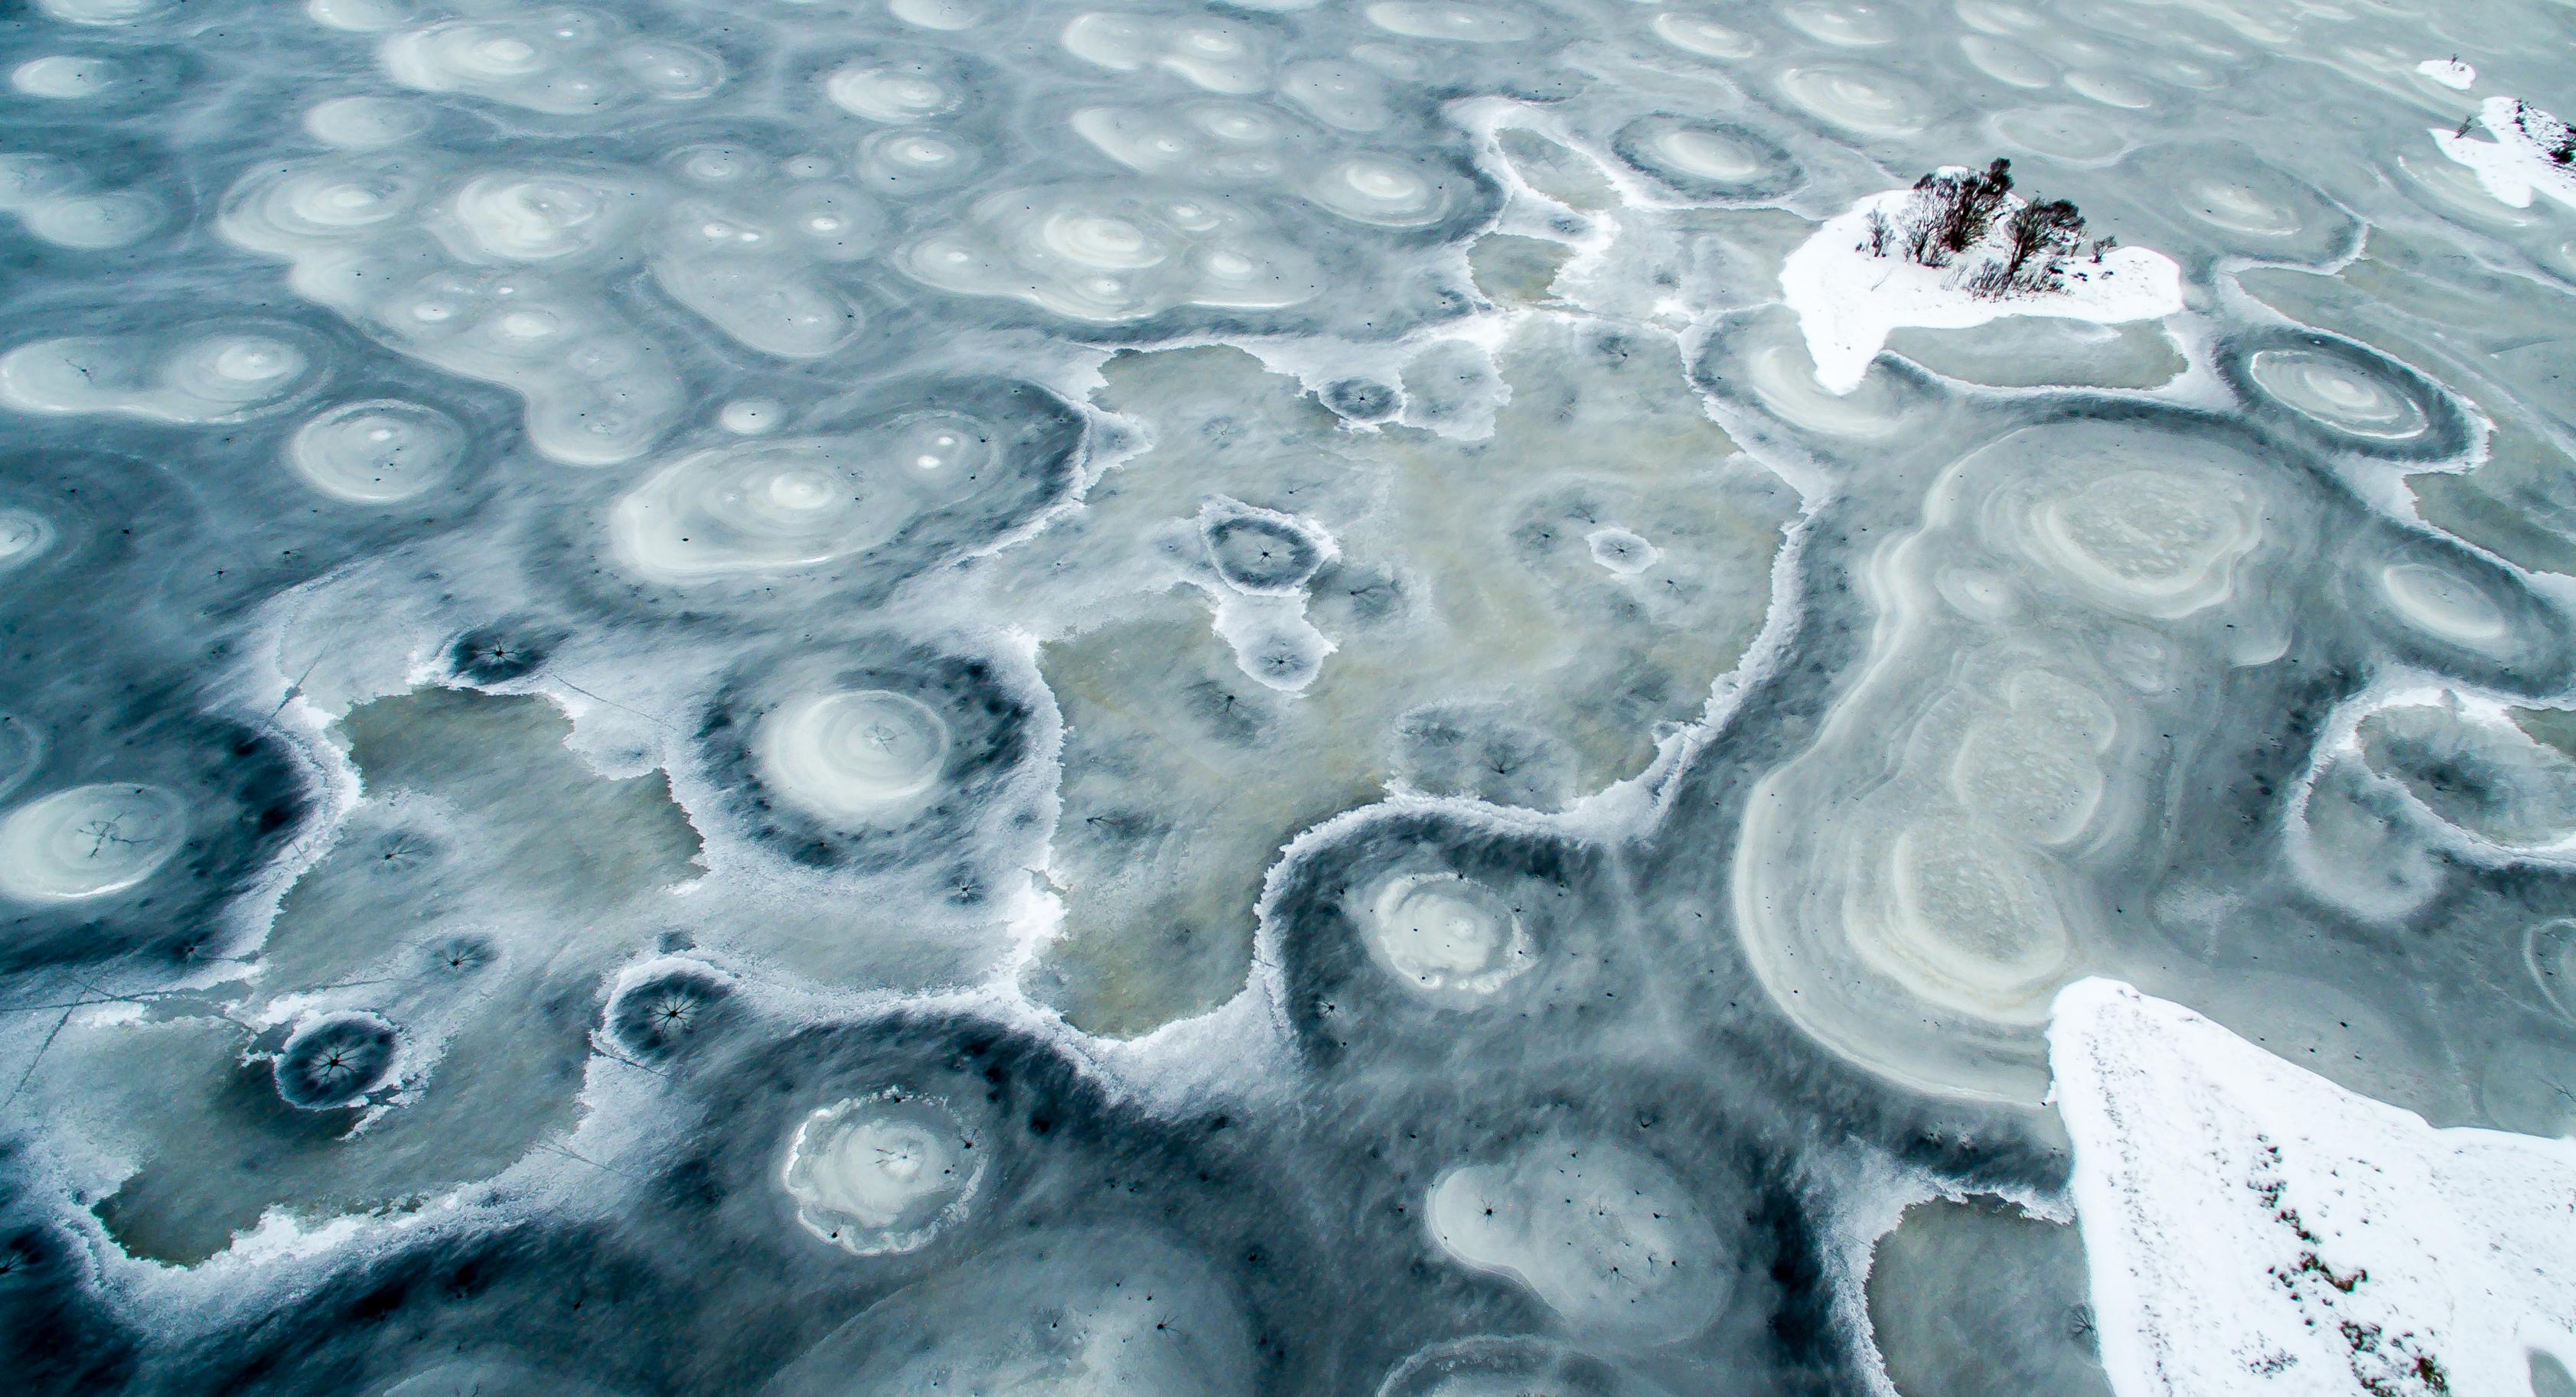 Icy Loch Droma (Liam Anderstrem)